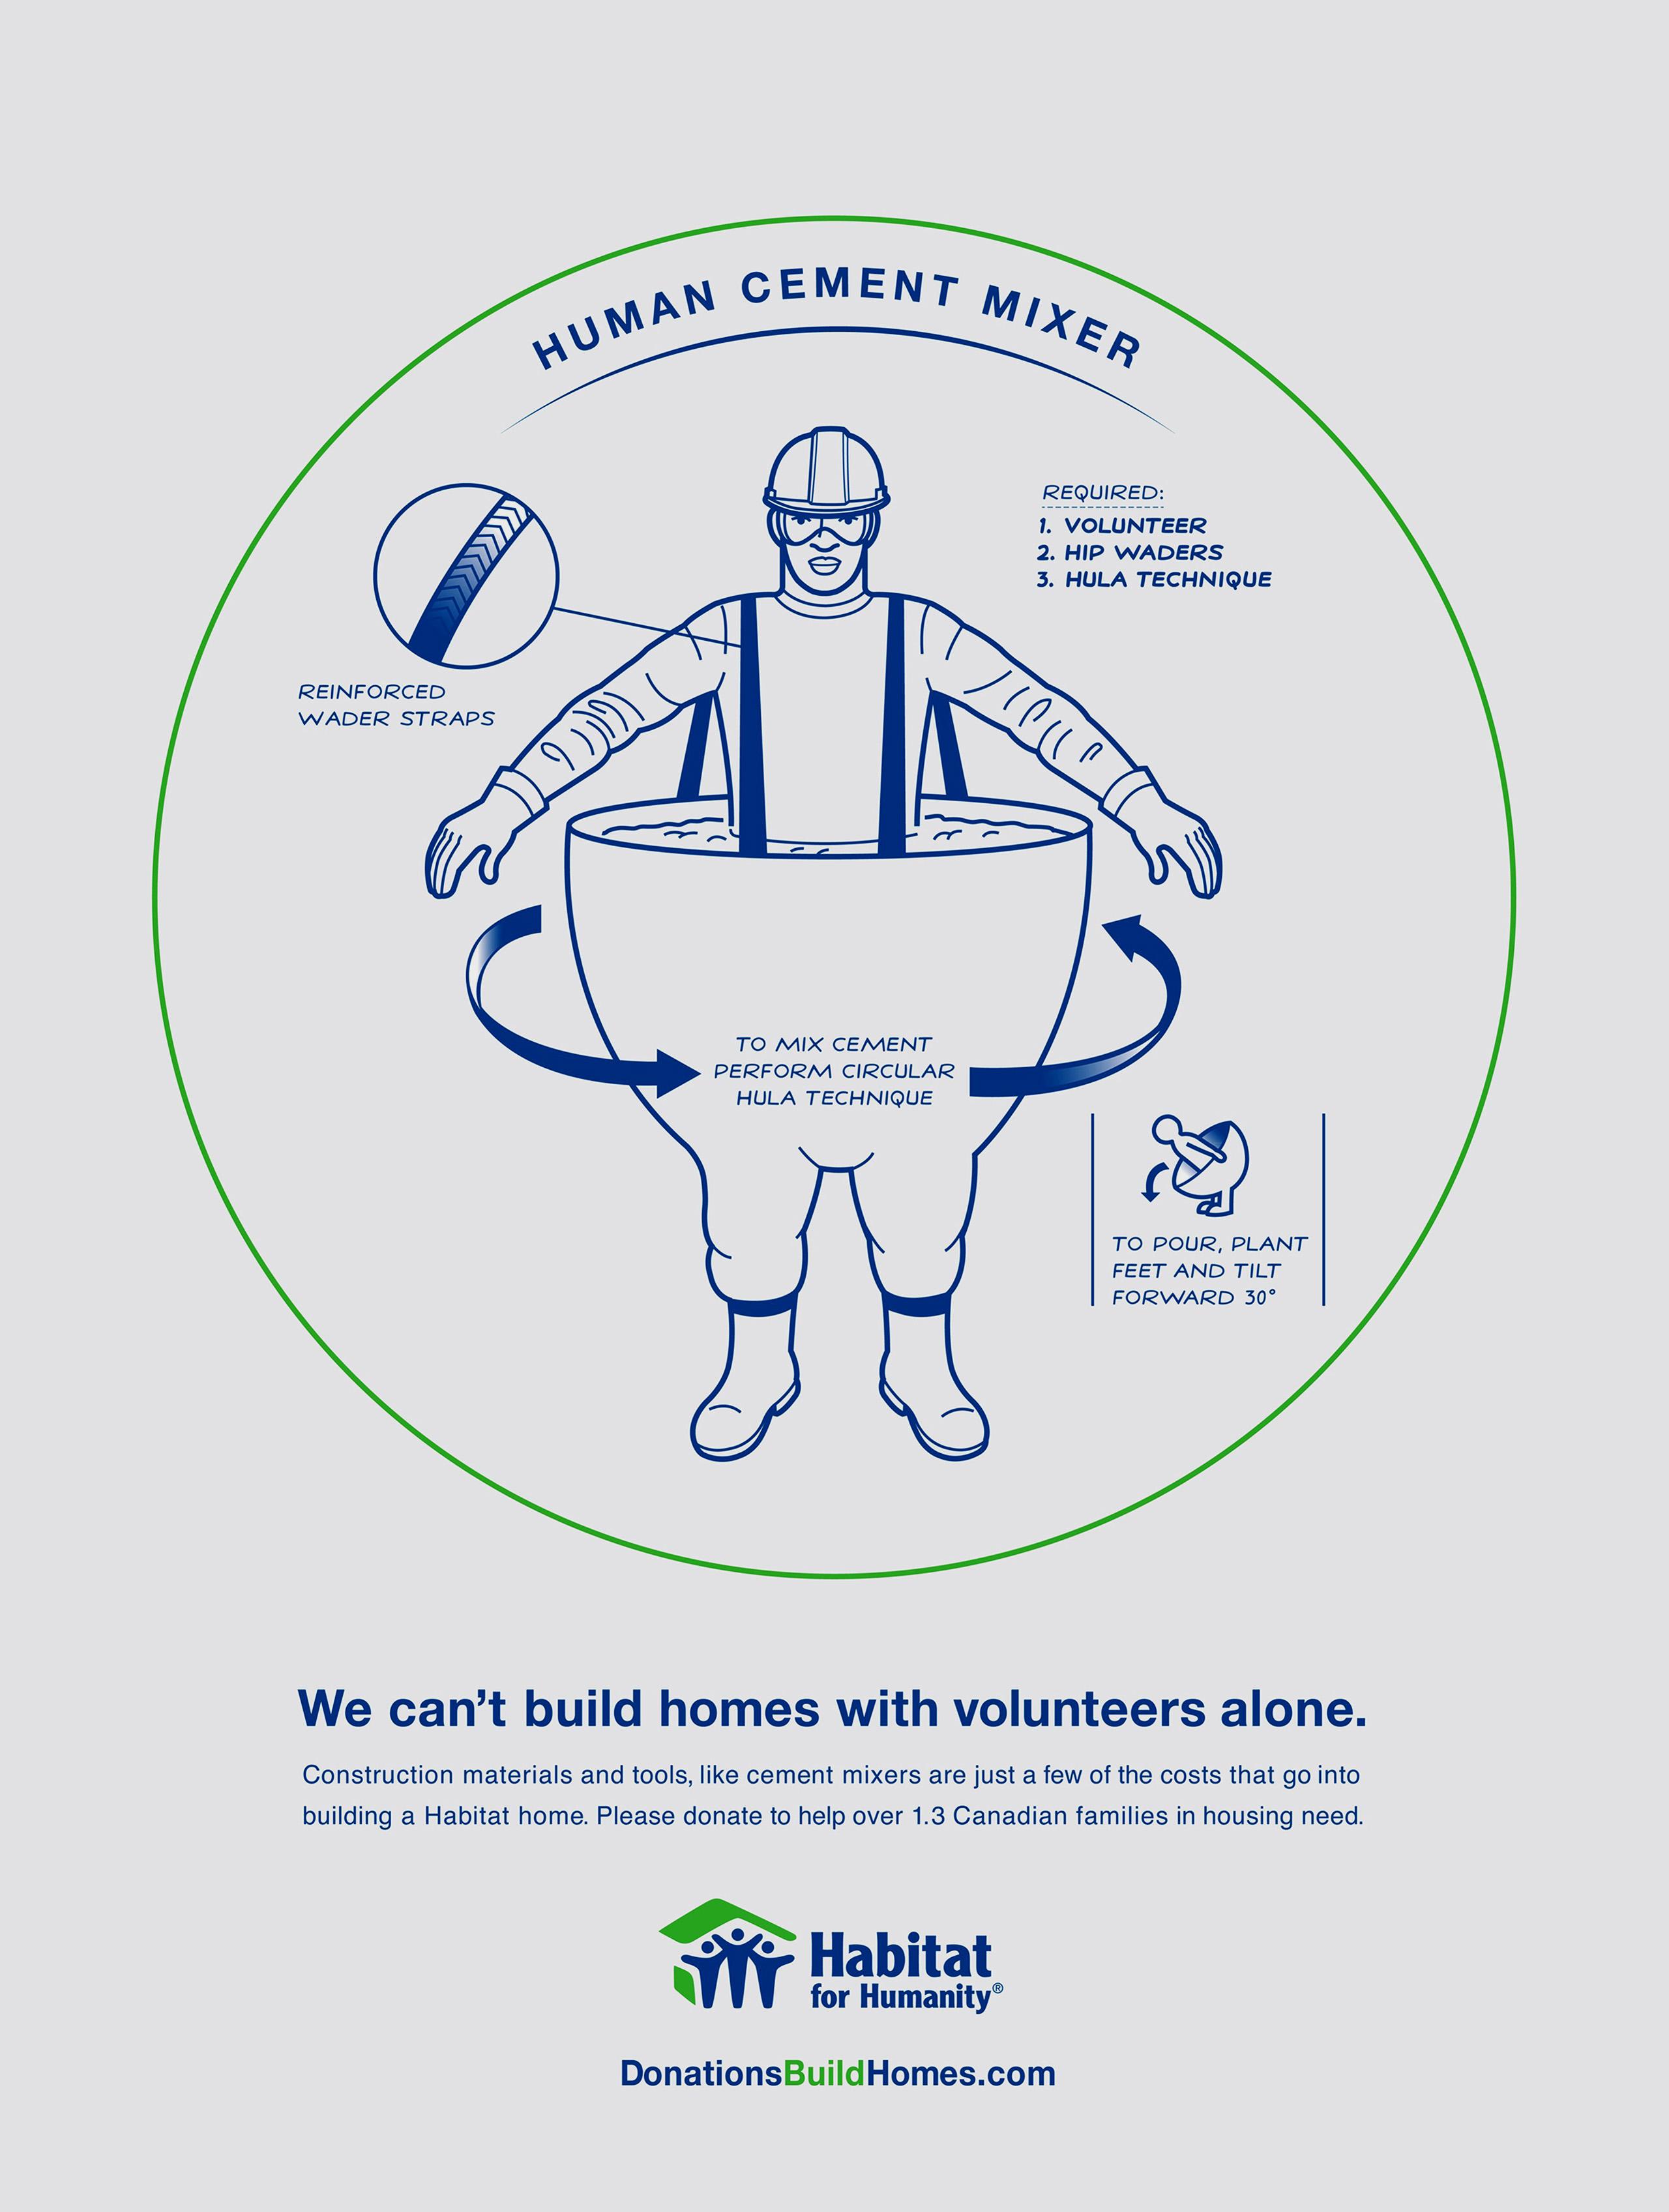 habitat-for-humanity-human-cement-mixer-2000-32844